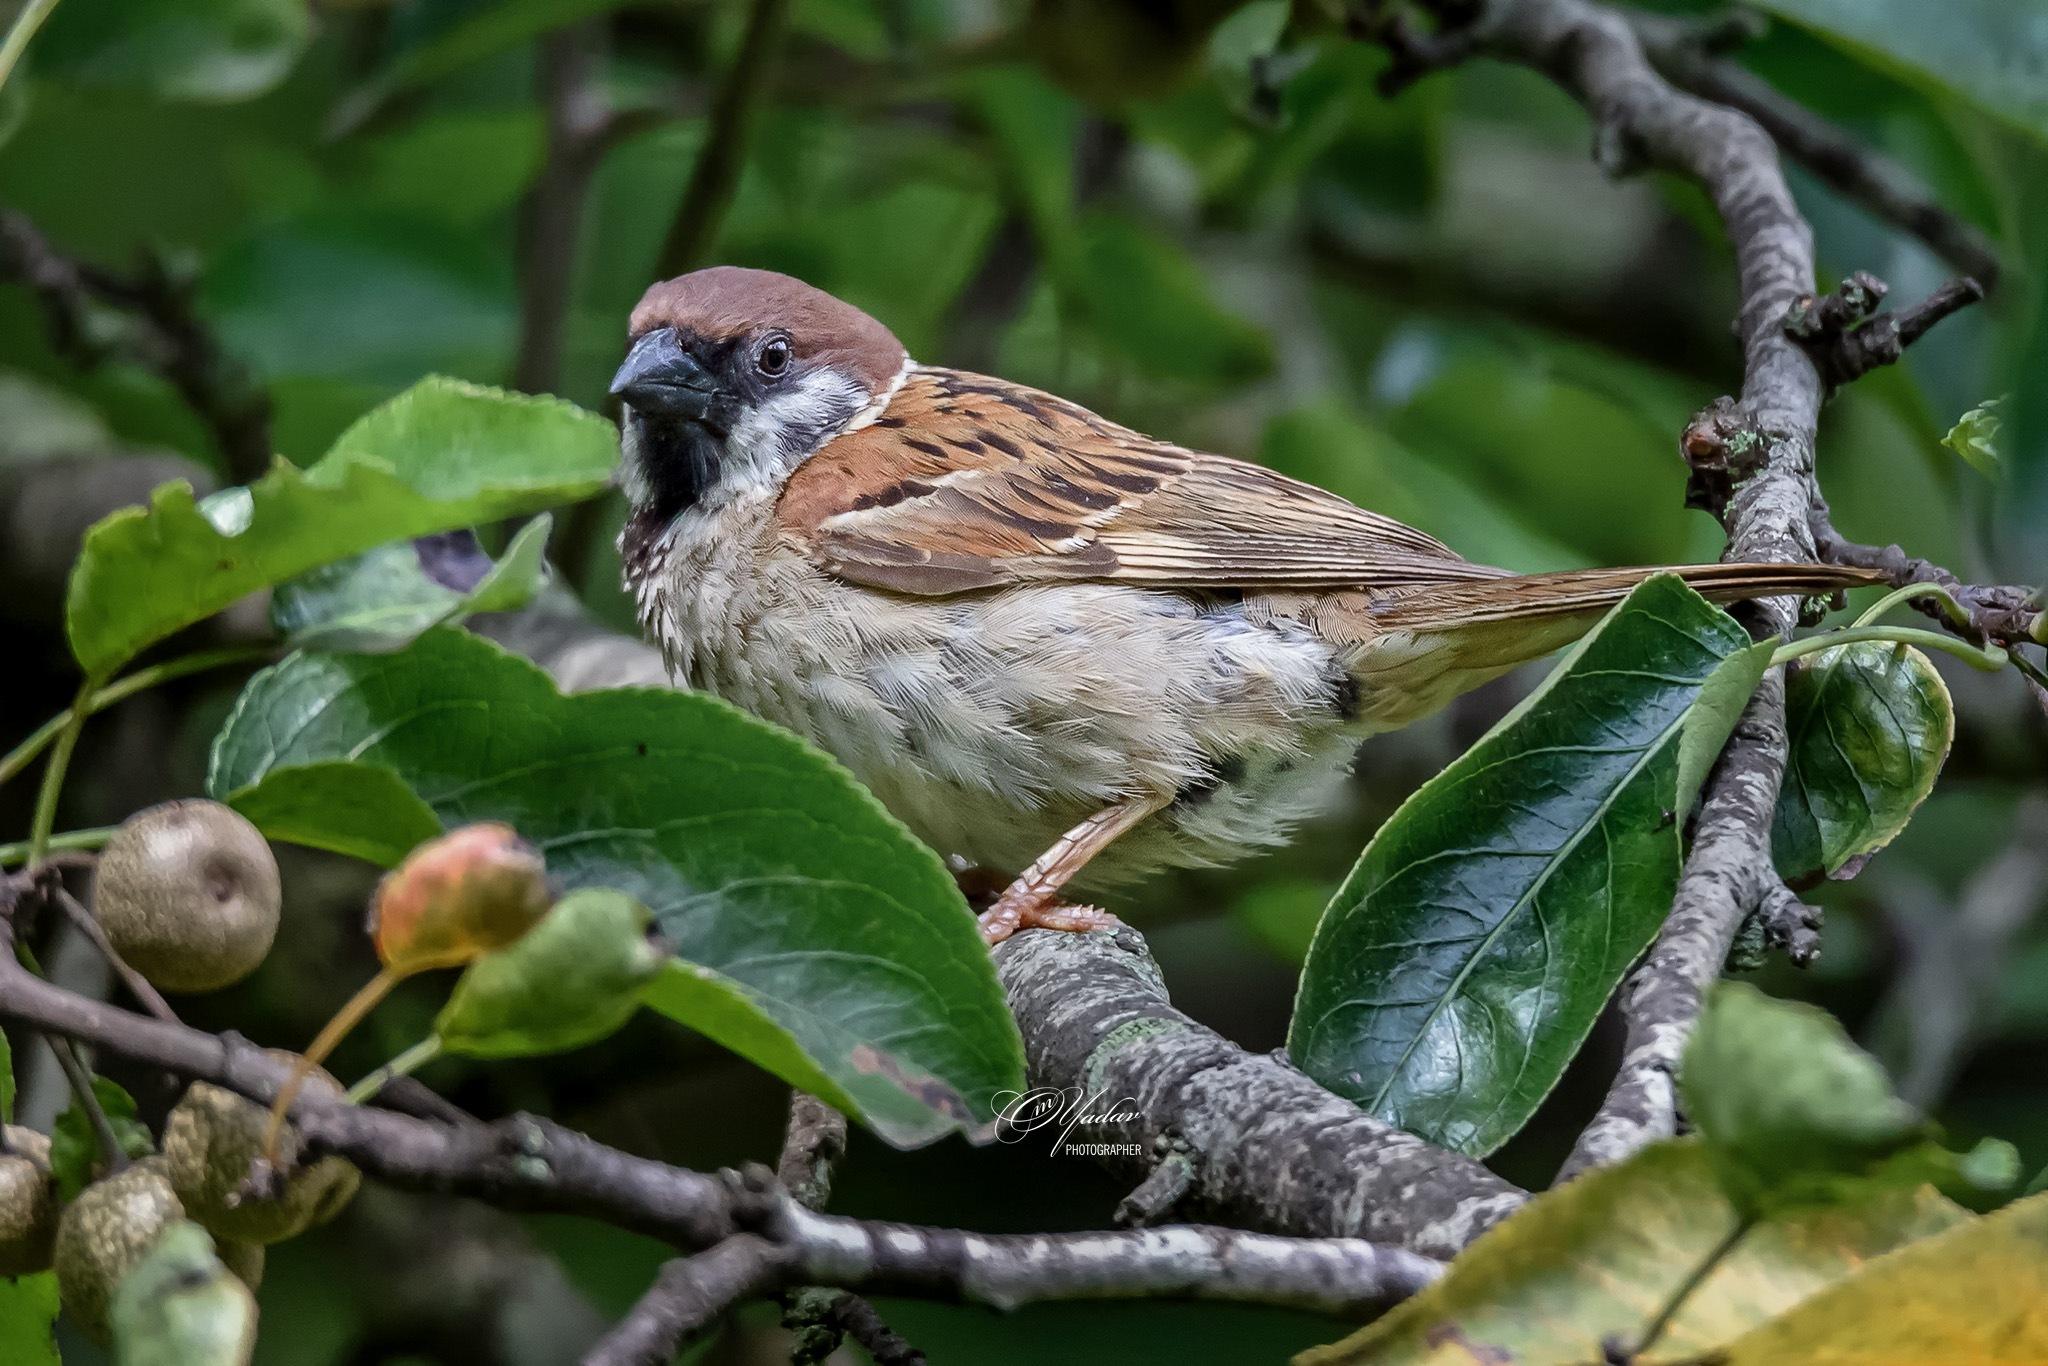 Eurasian Tree Sparrow by Om Yadav